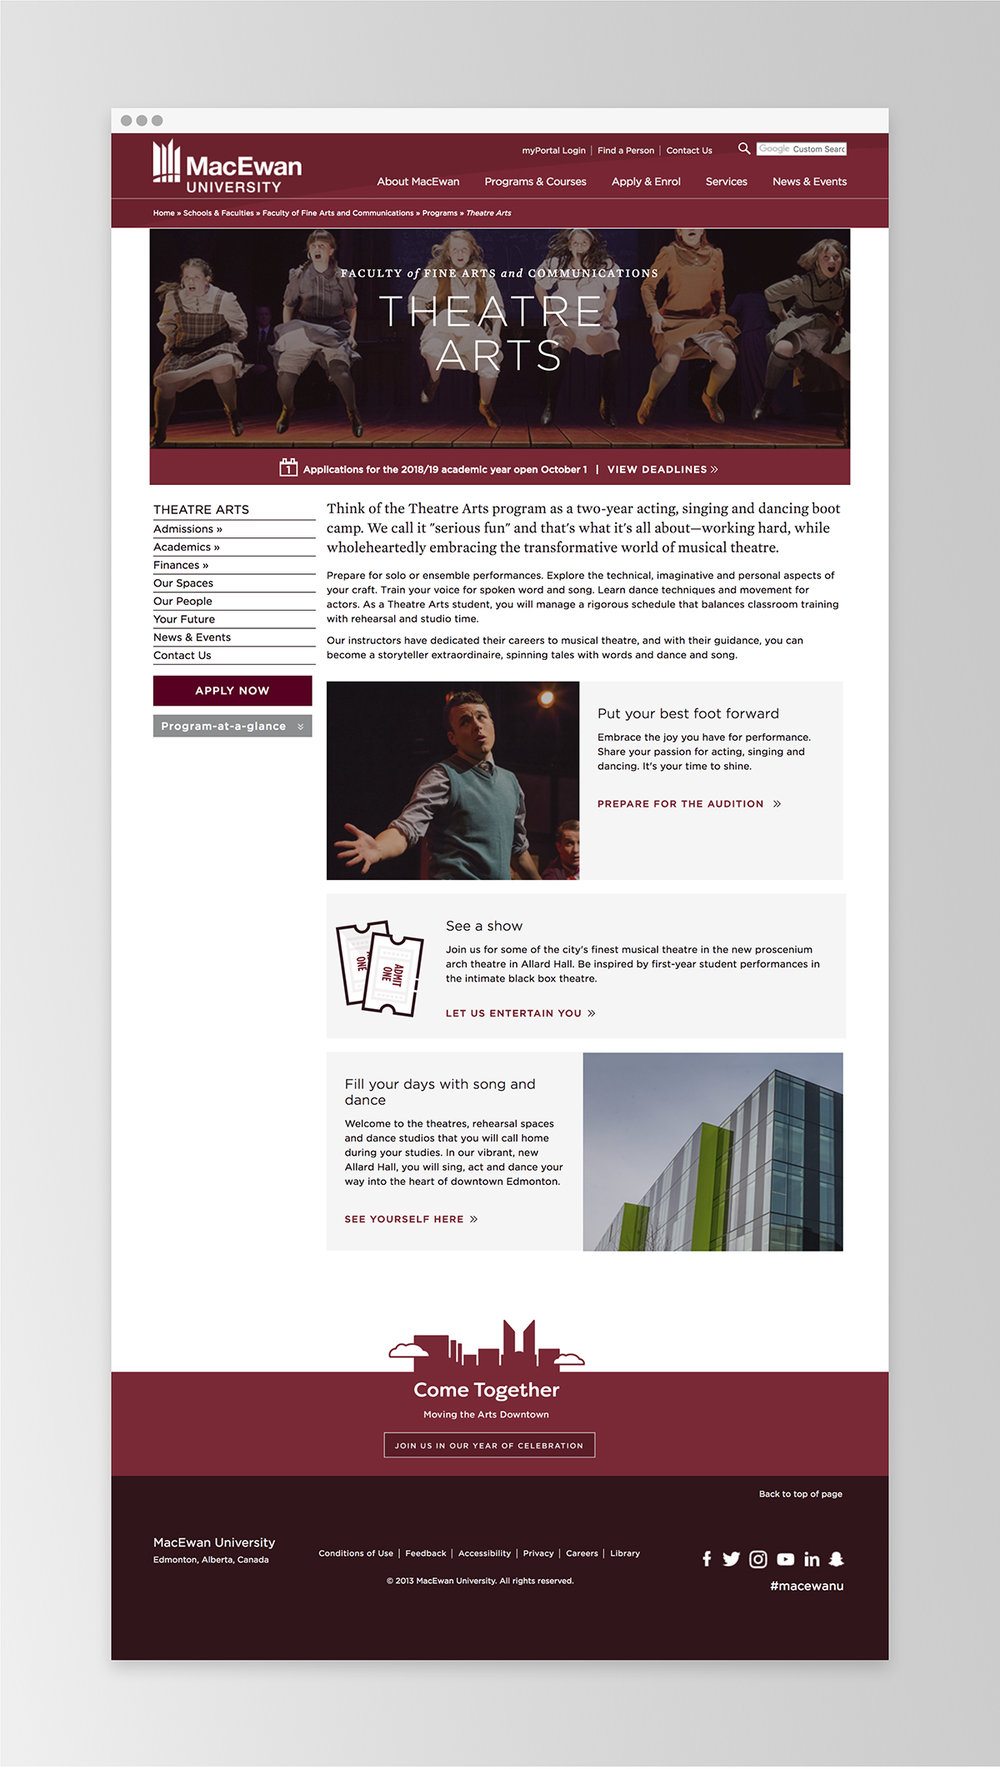 An example of the new MacEwan site template | MacEwan.ca/TheatreArts